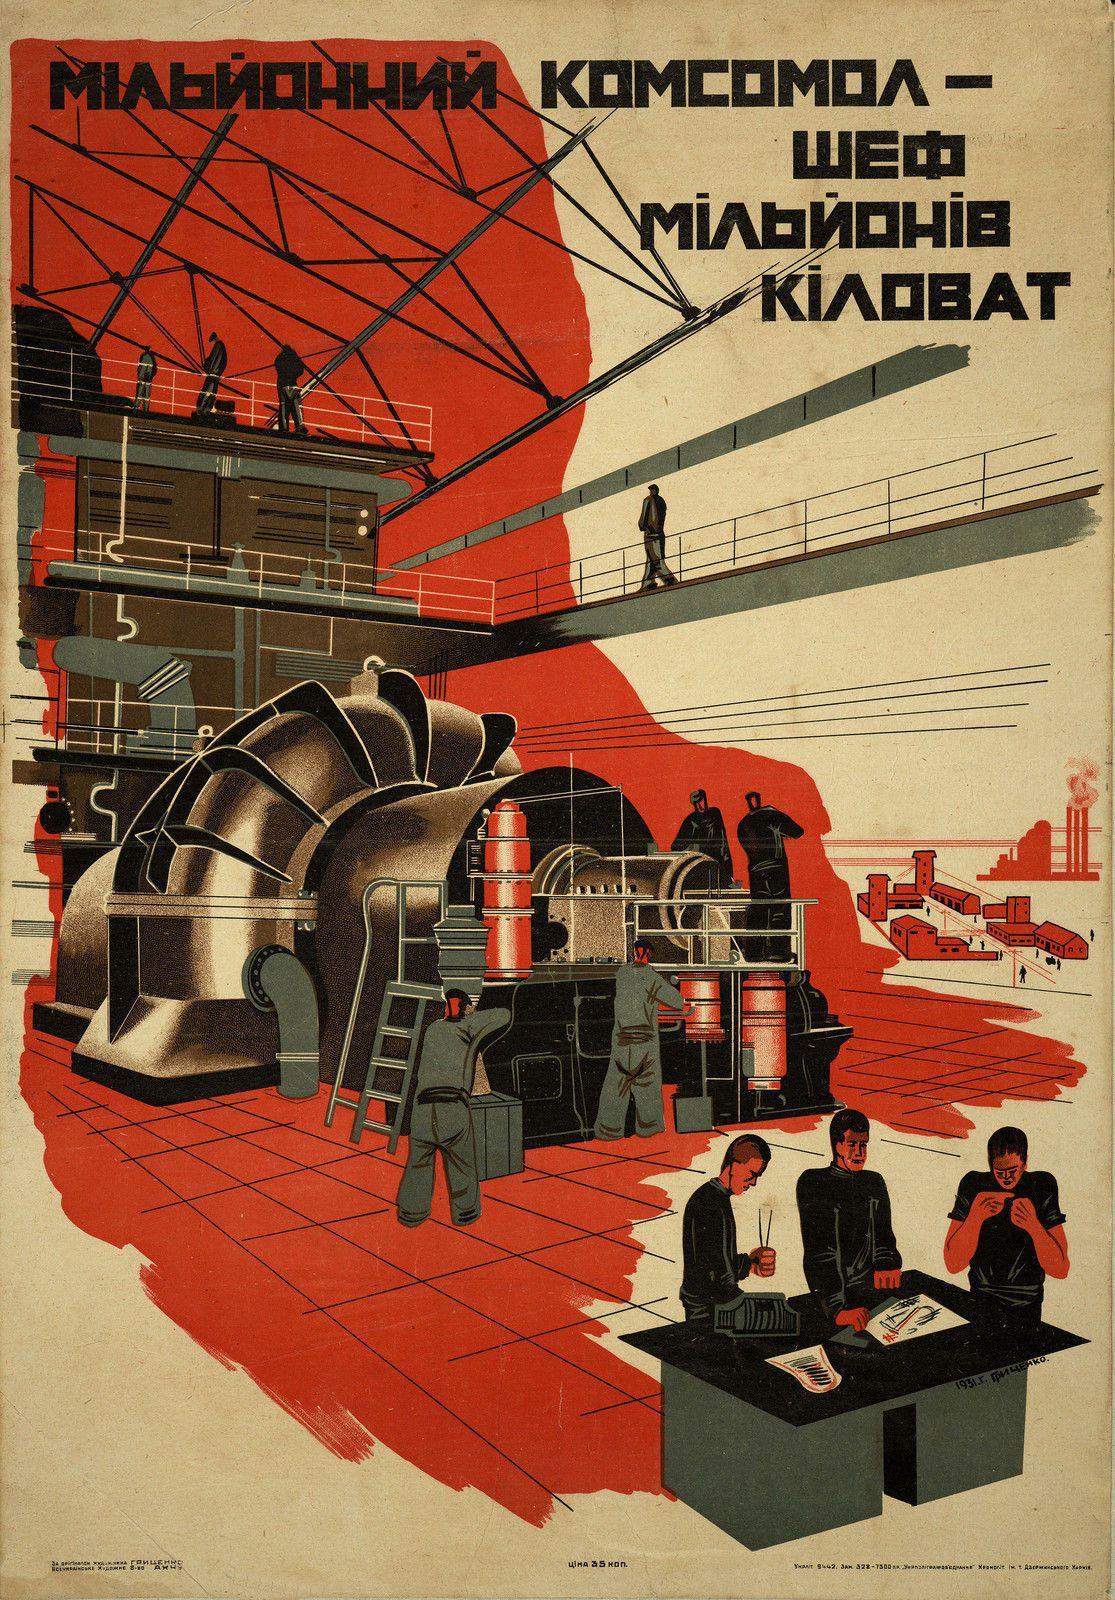 sovi tique militaire russe urss propagande industrielle poster art print a3 ebay. Black Bedroom Furniture Sets. Home Design Ideas